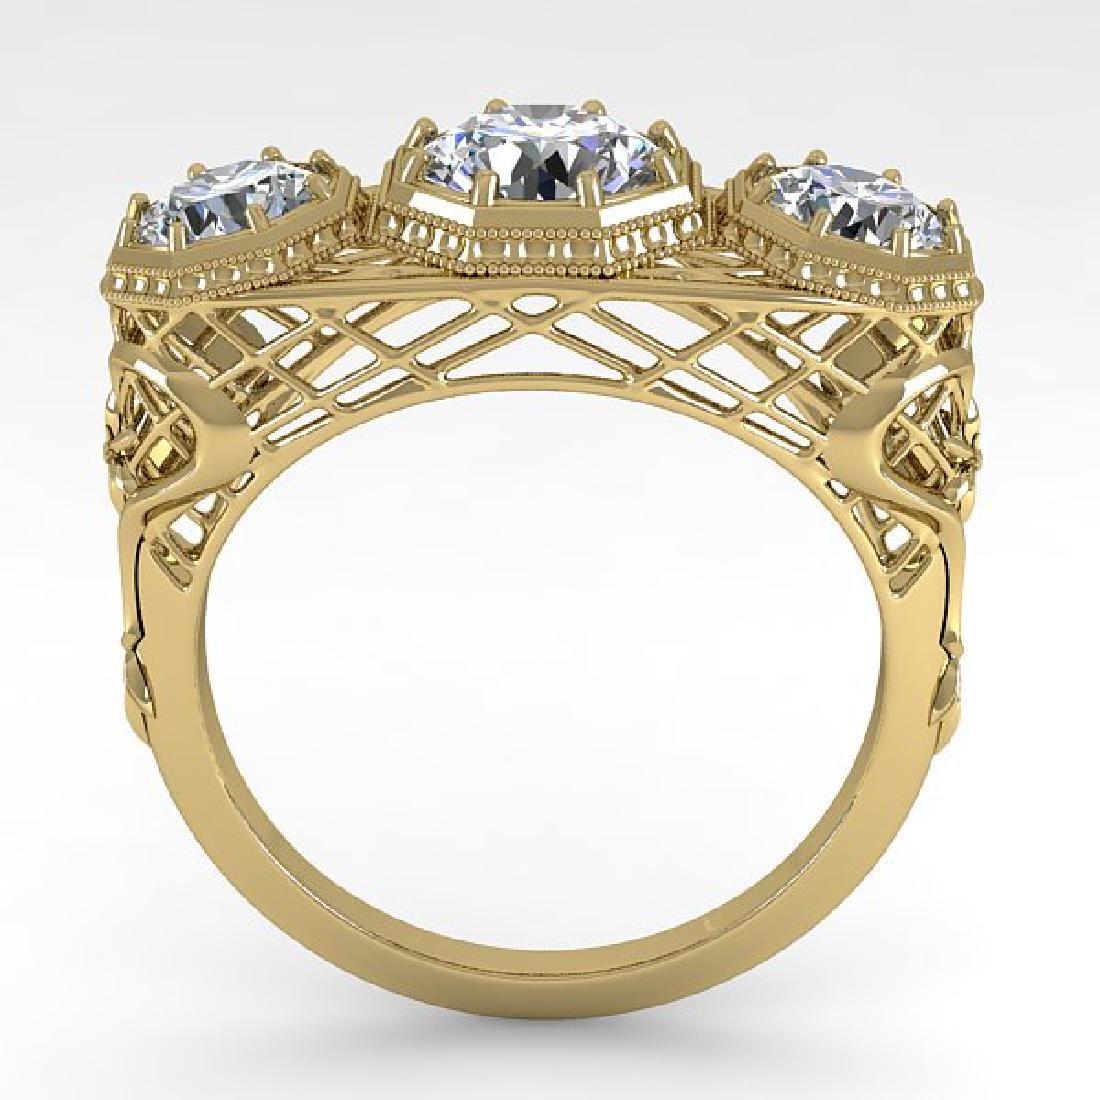 2 CTW VS/SI Diamond Ring 14K Yellow Gold - 3